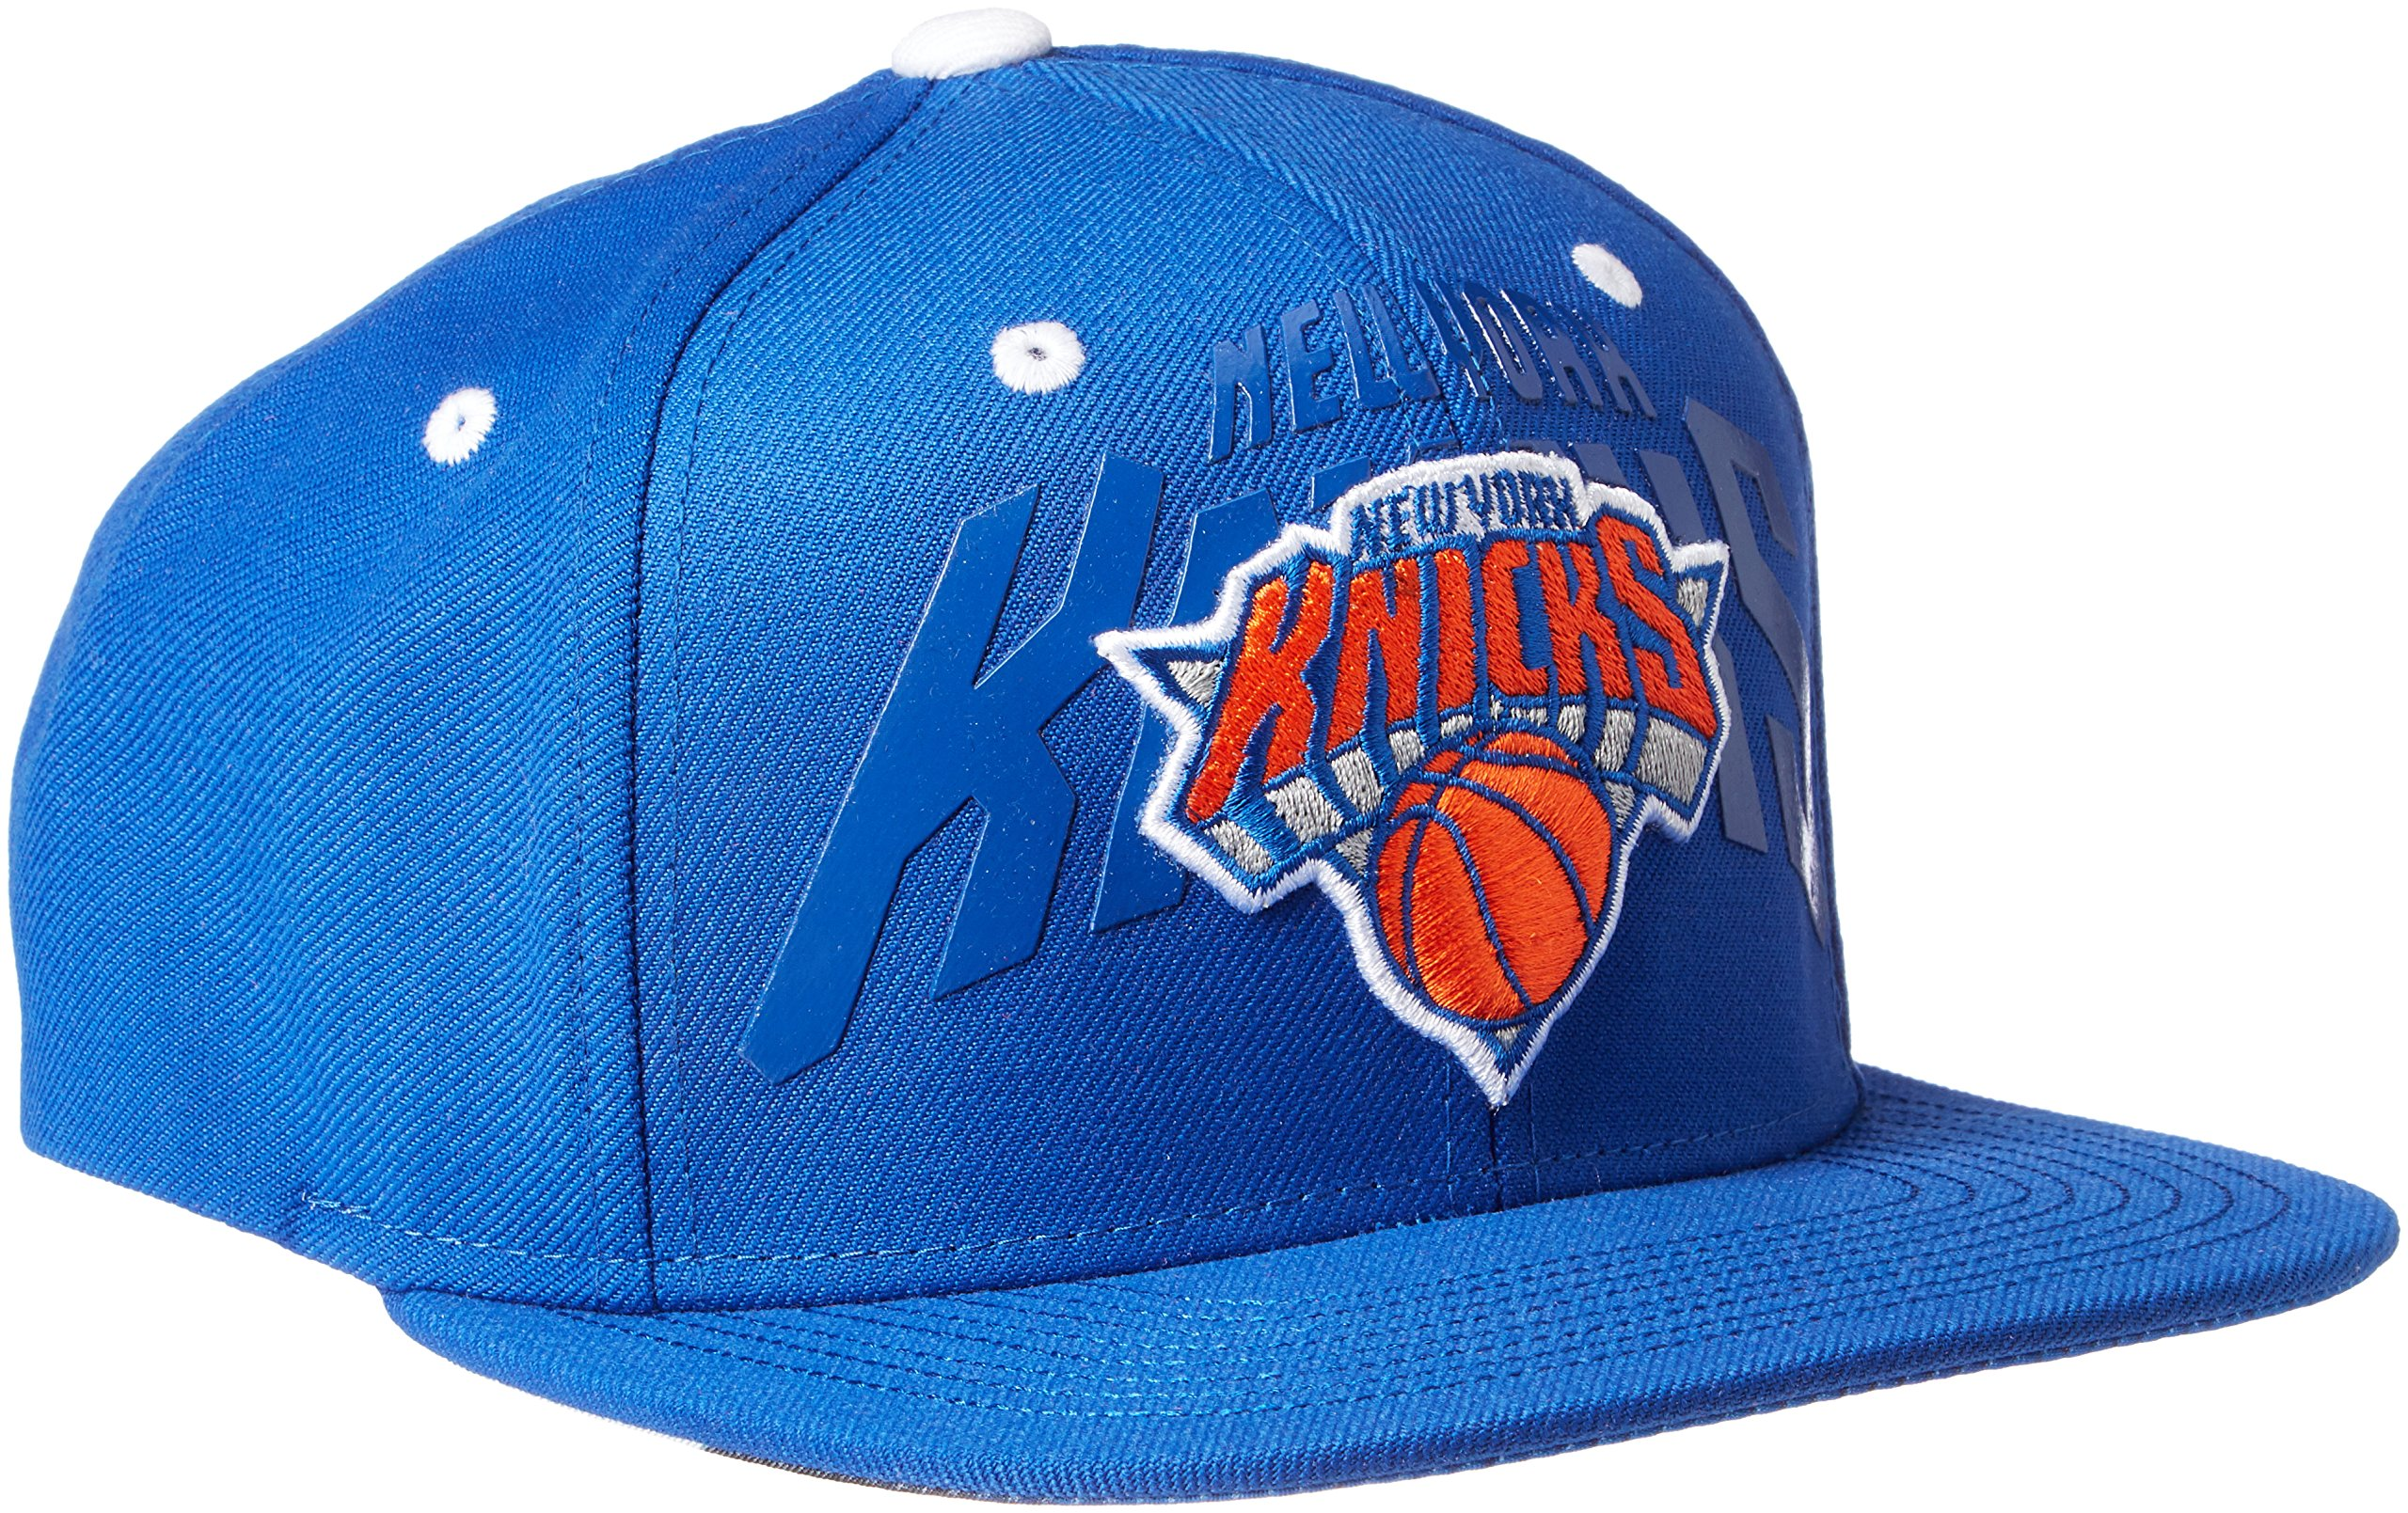 Adidas, Cappello New York Knicks Anthem, Blu (Pantone), M